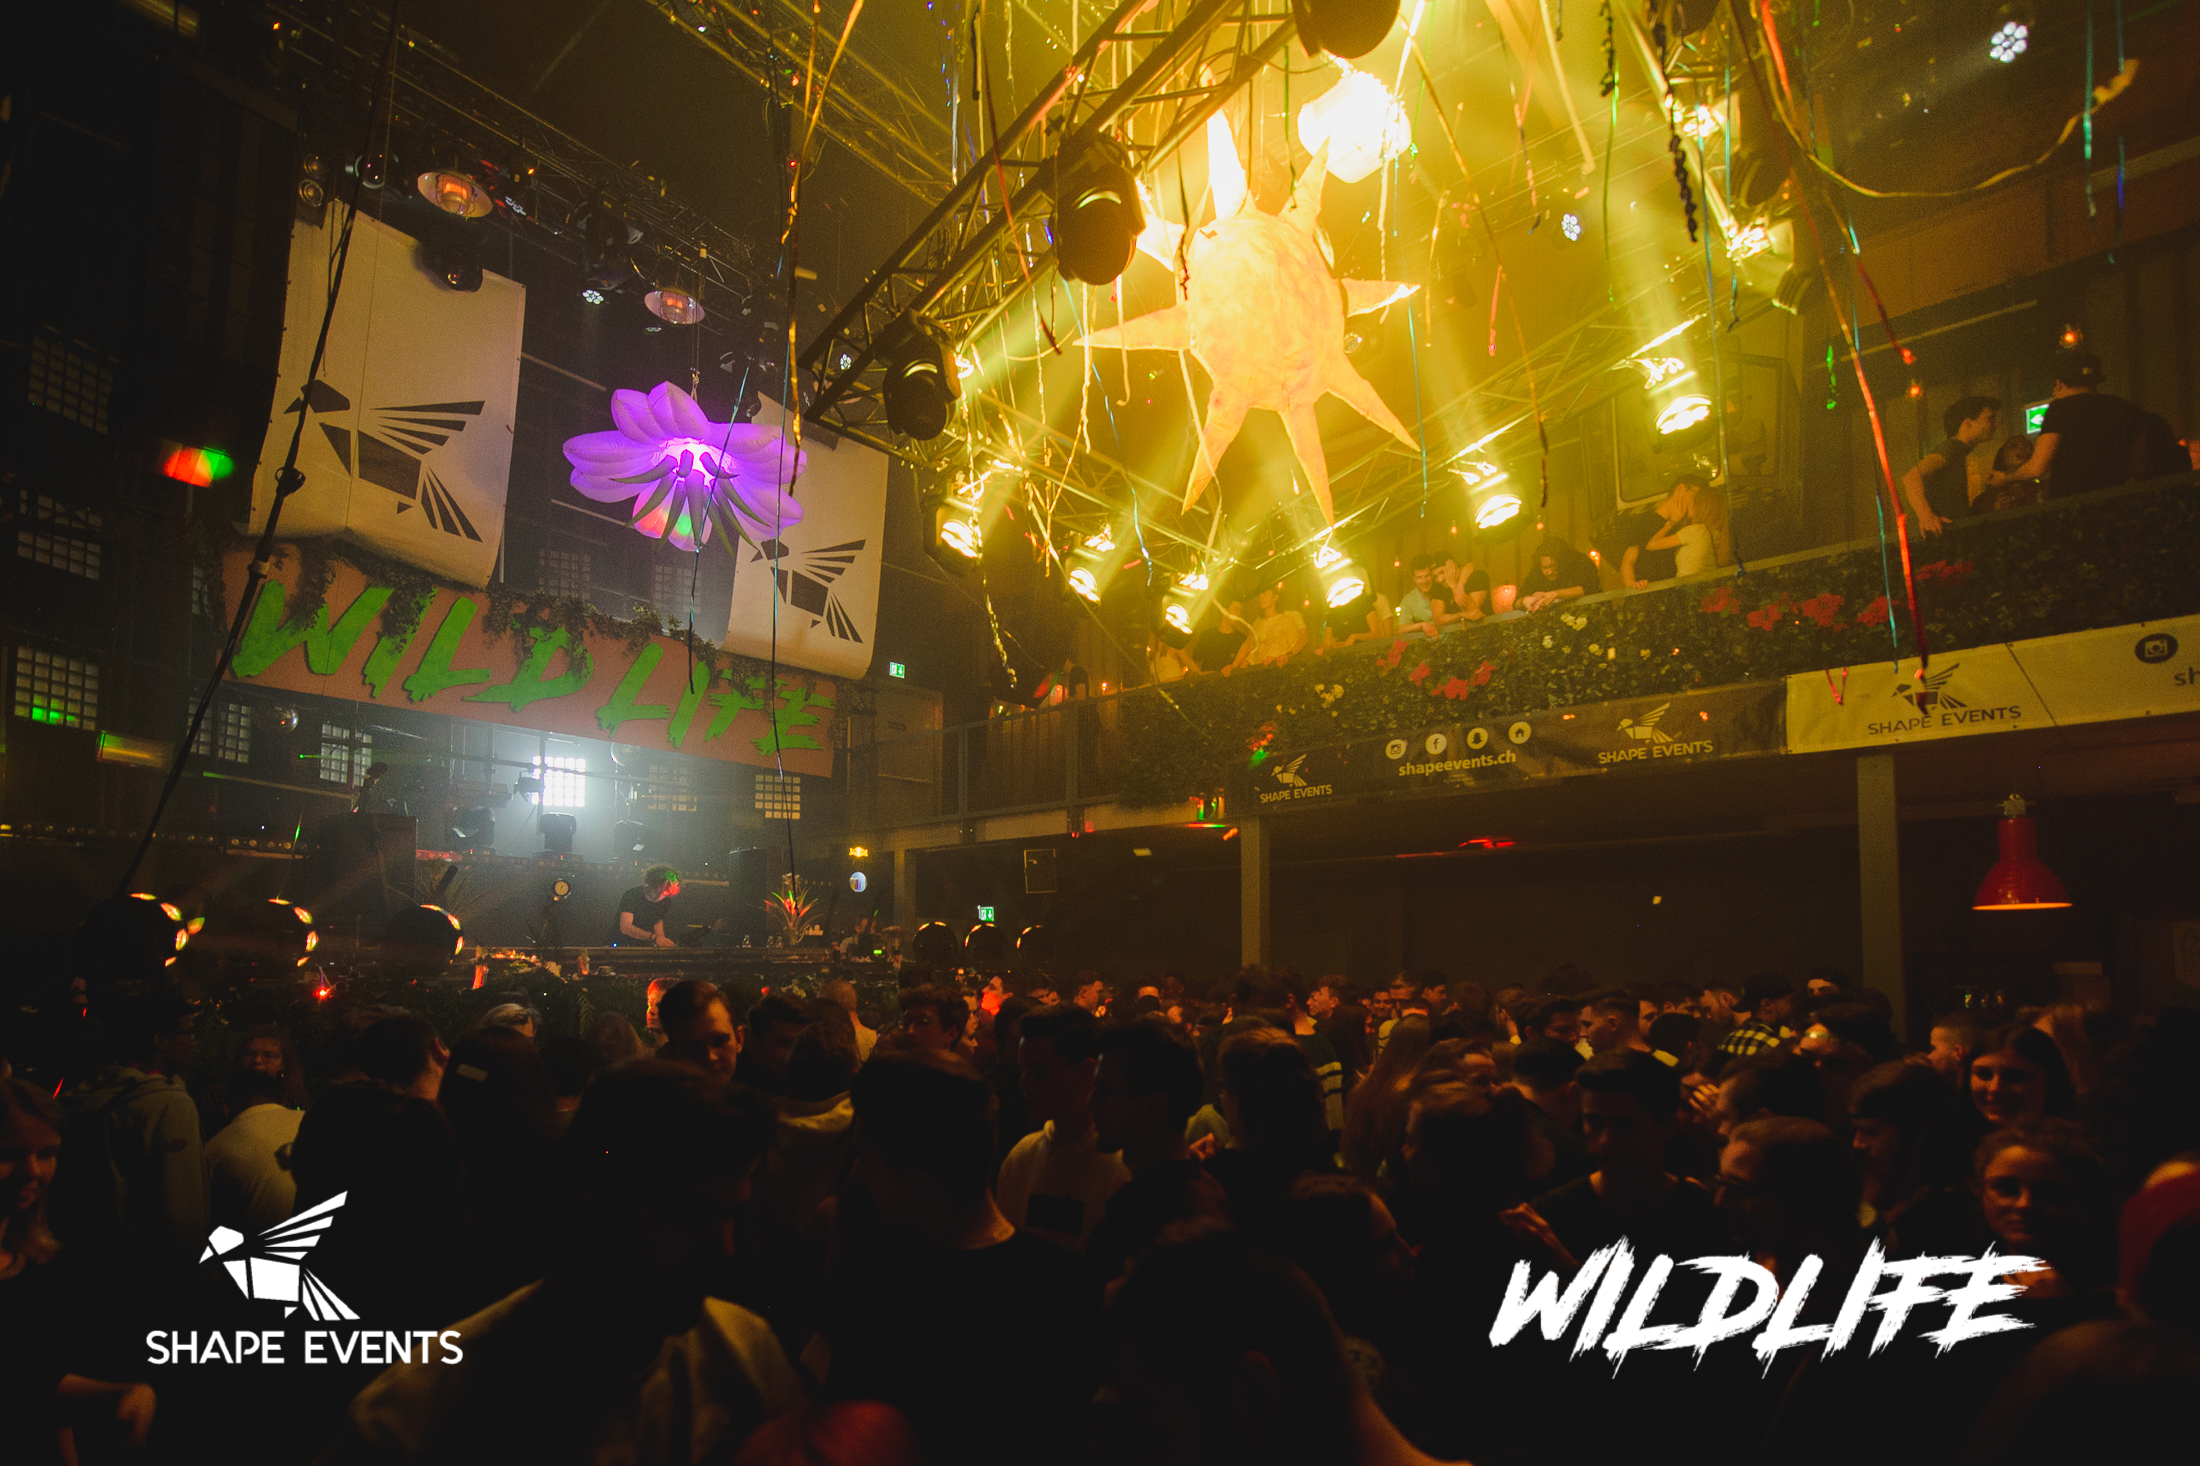 Wildlife-11.jpg